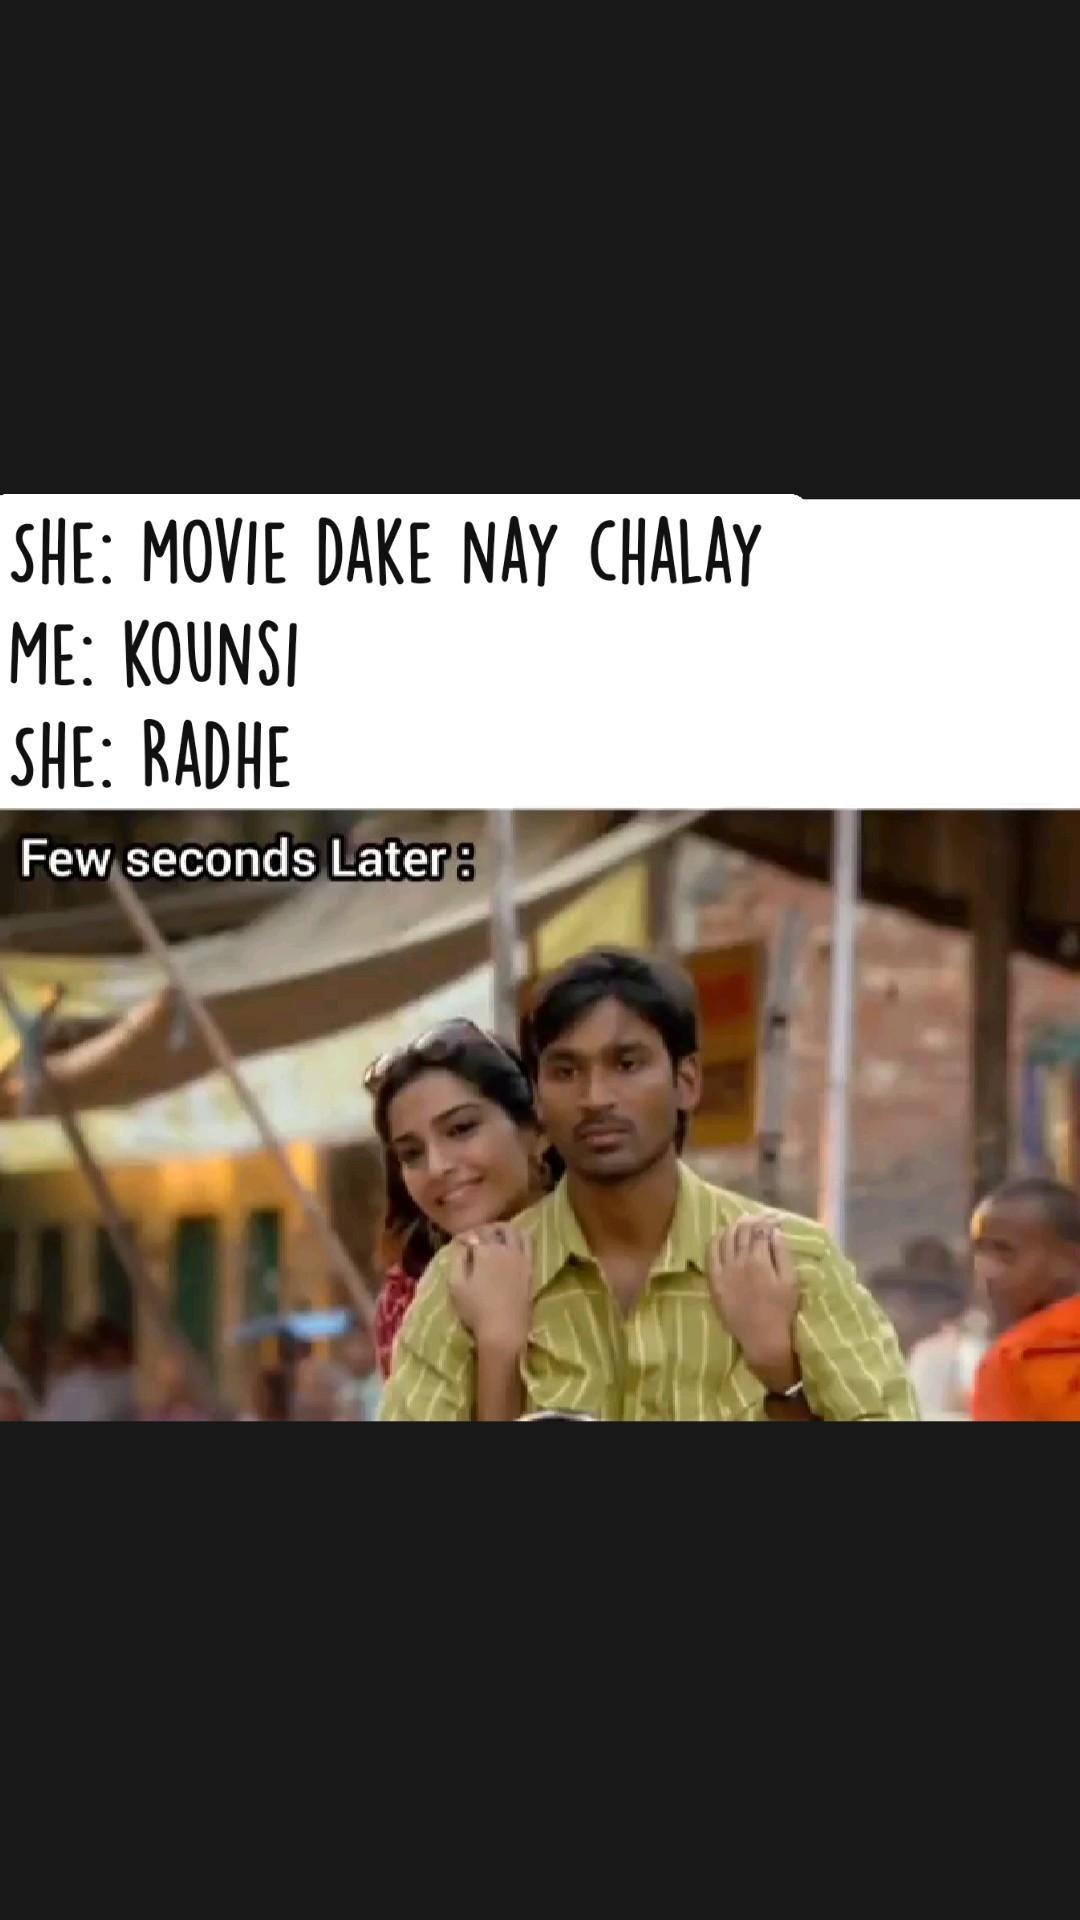 She: movie dake nay chalay Me: kounsi                    She: Radhe